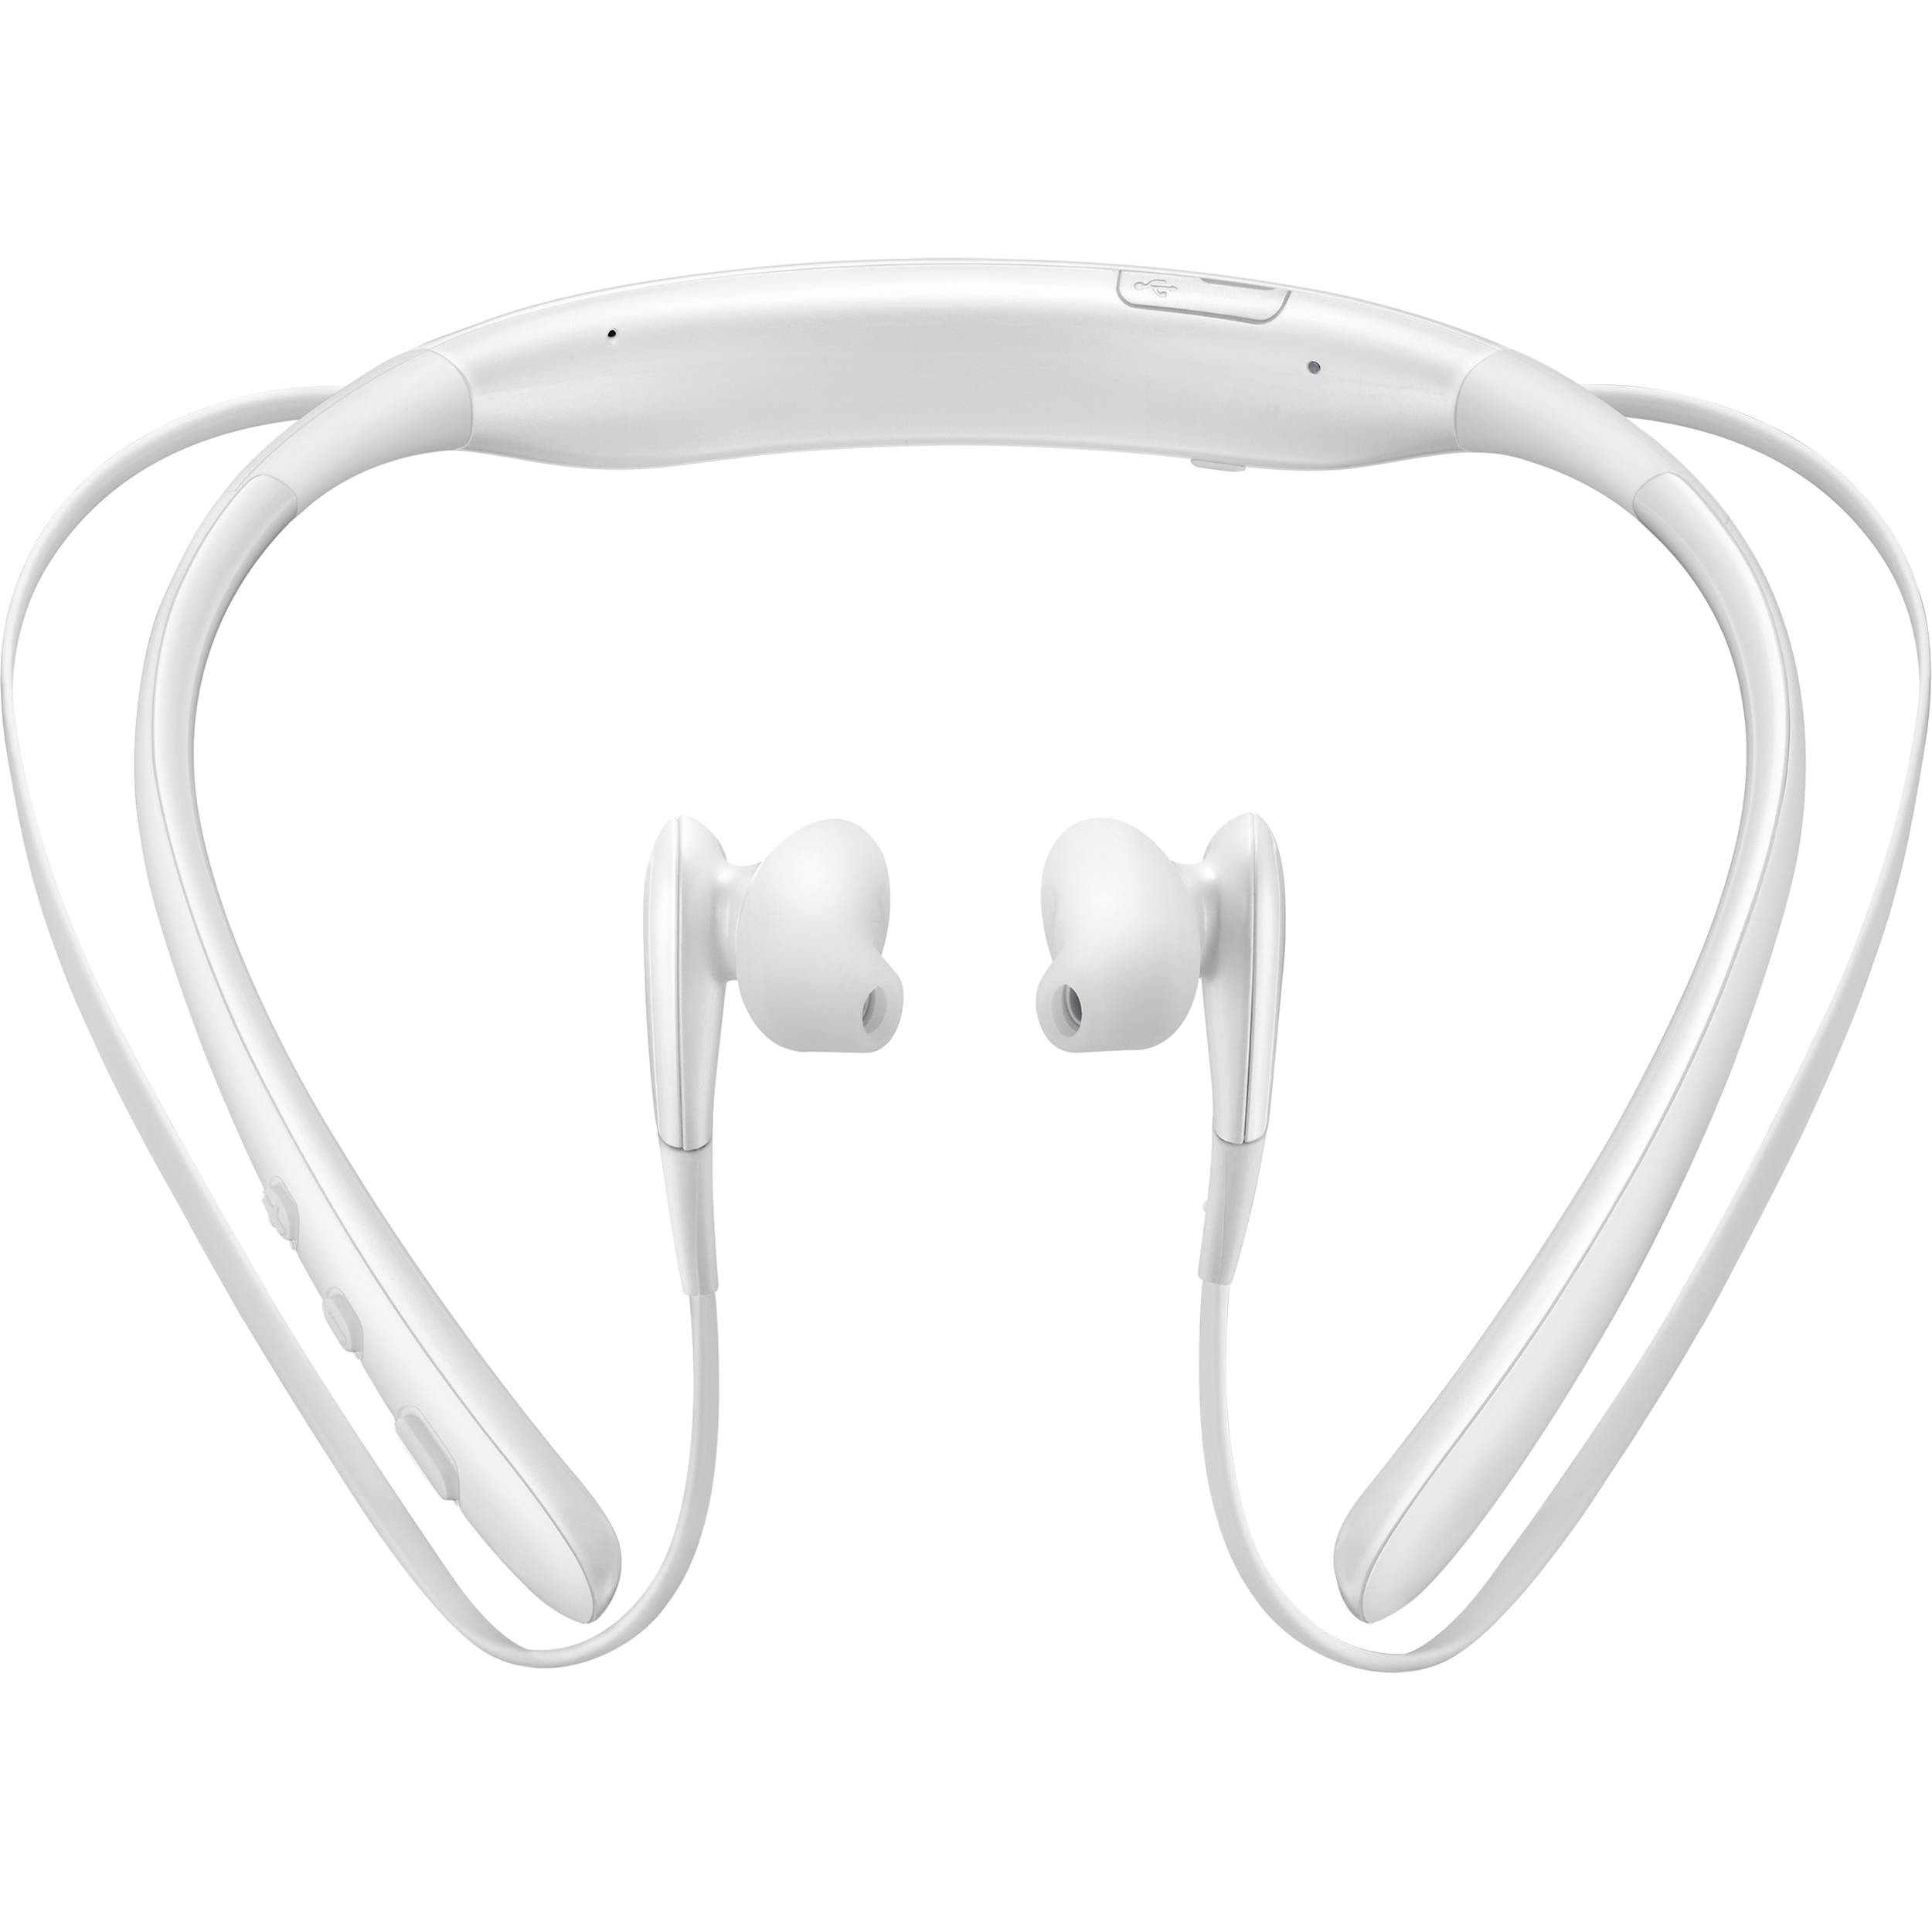 Earbuds samsung active - wireless earbuds bluetooth samsung